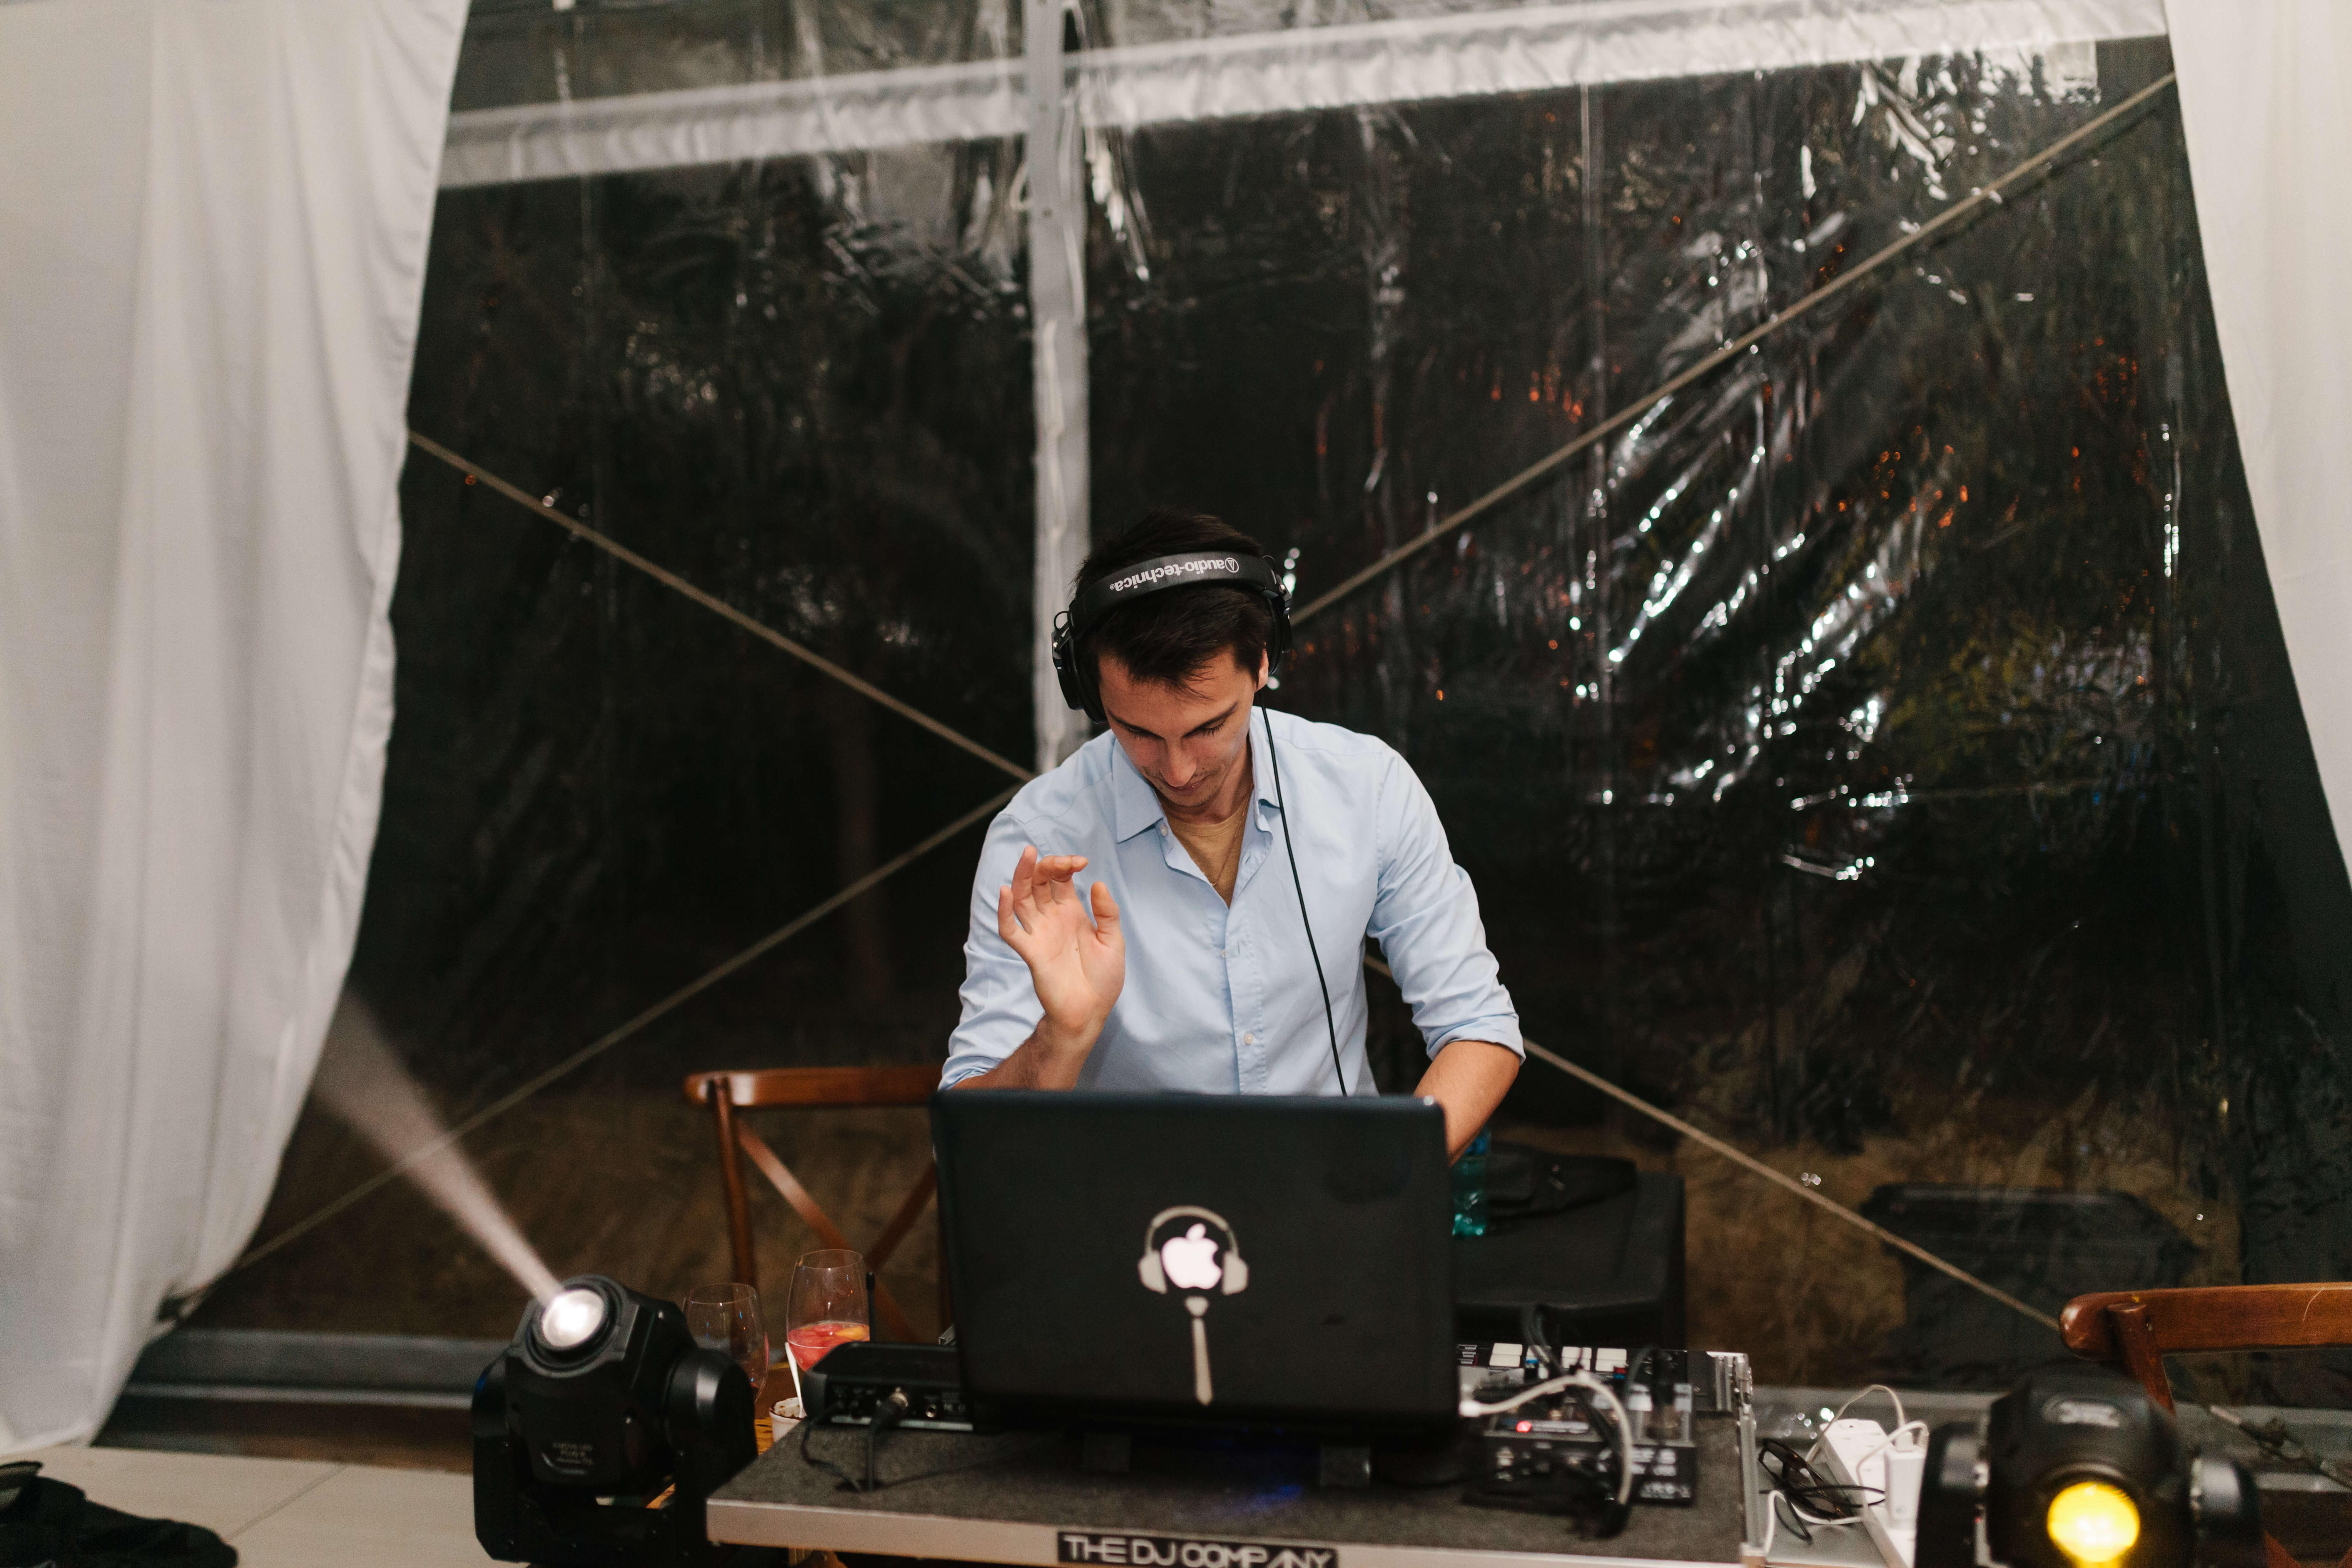 a Cape Town wedding DJ with a controller and laptop playing a set at an outdoor Stellenbosch wedding.